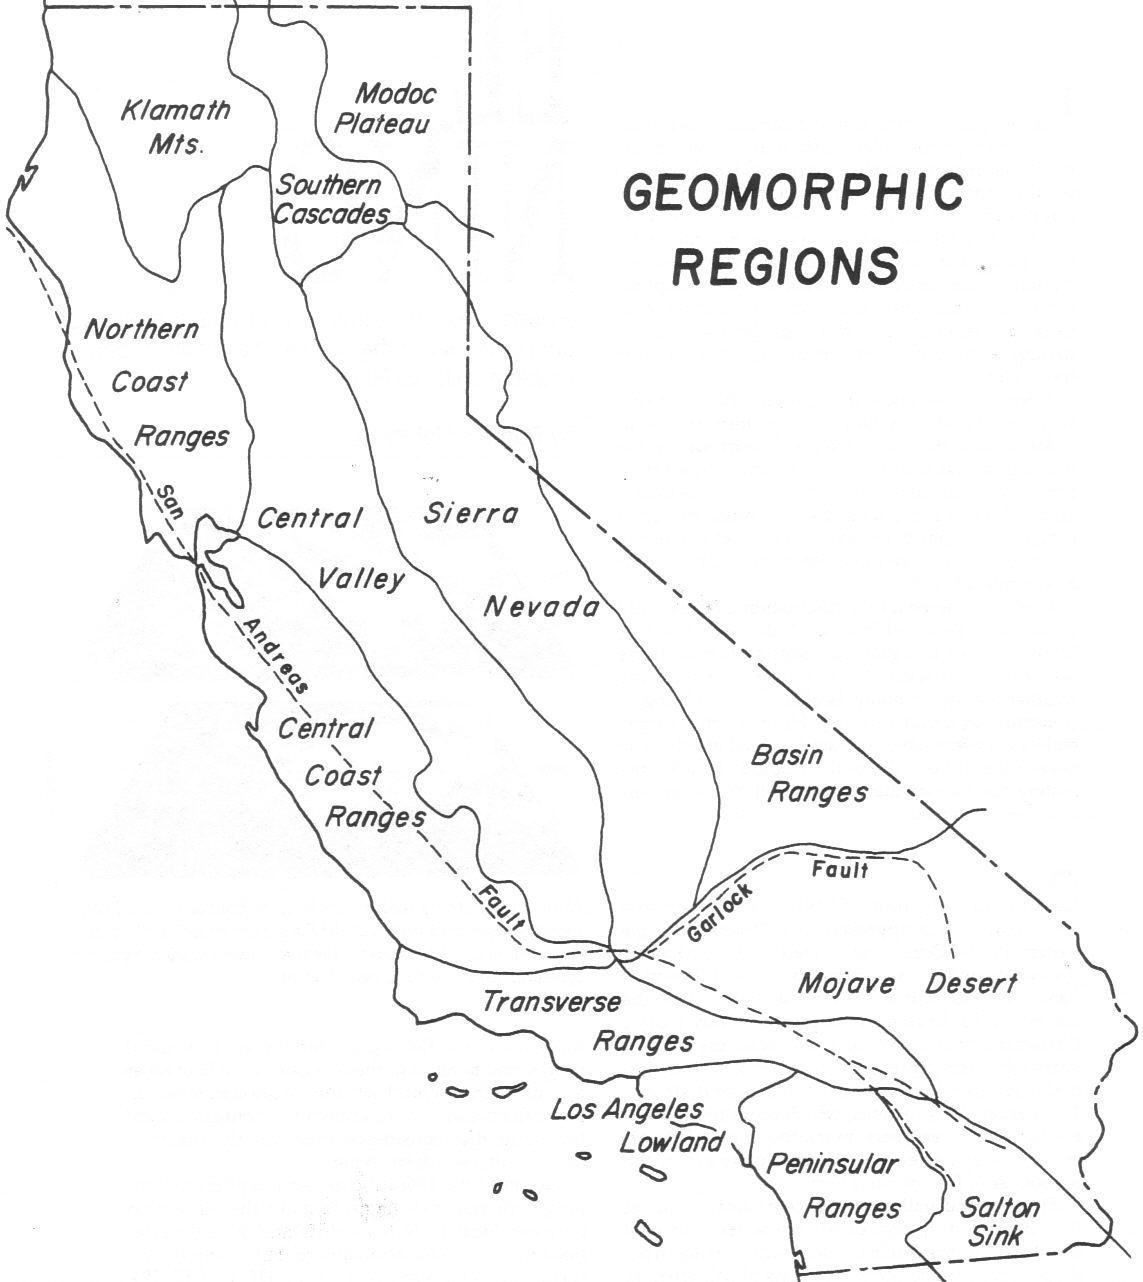 small resolution of Geomographic regions of California   California map